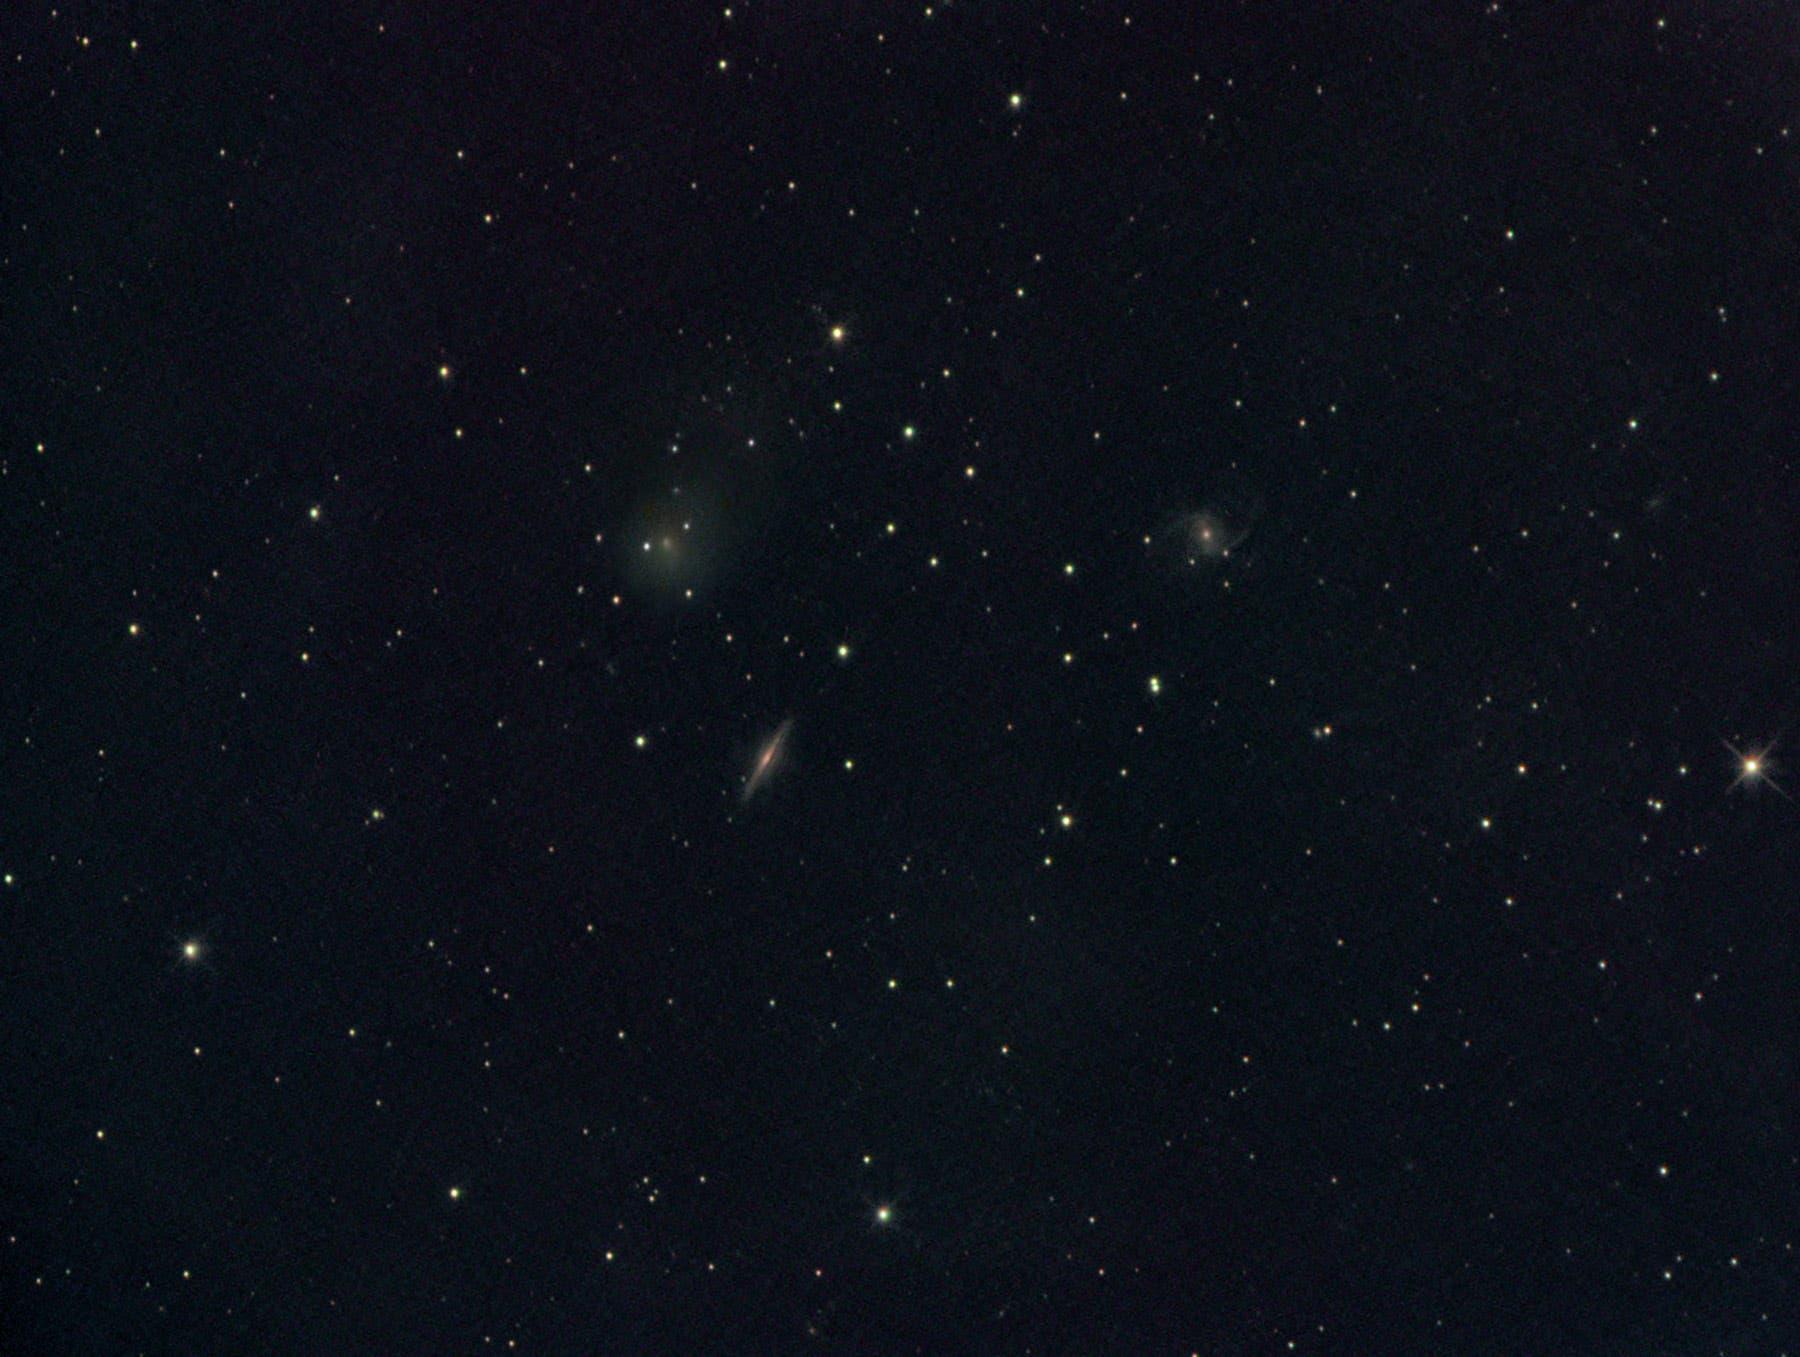 Lovejoy C/2014 Q2 bei NGC 5905 und NGC 5908